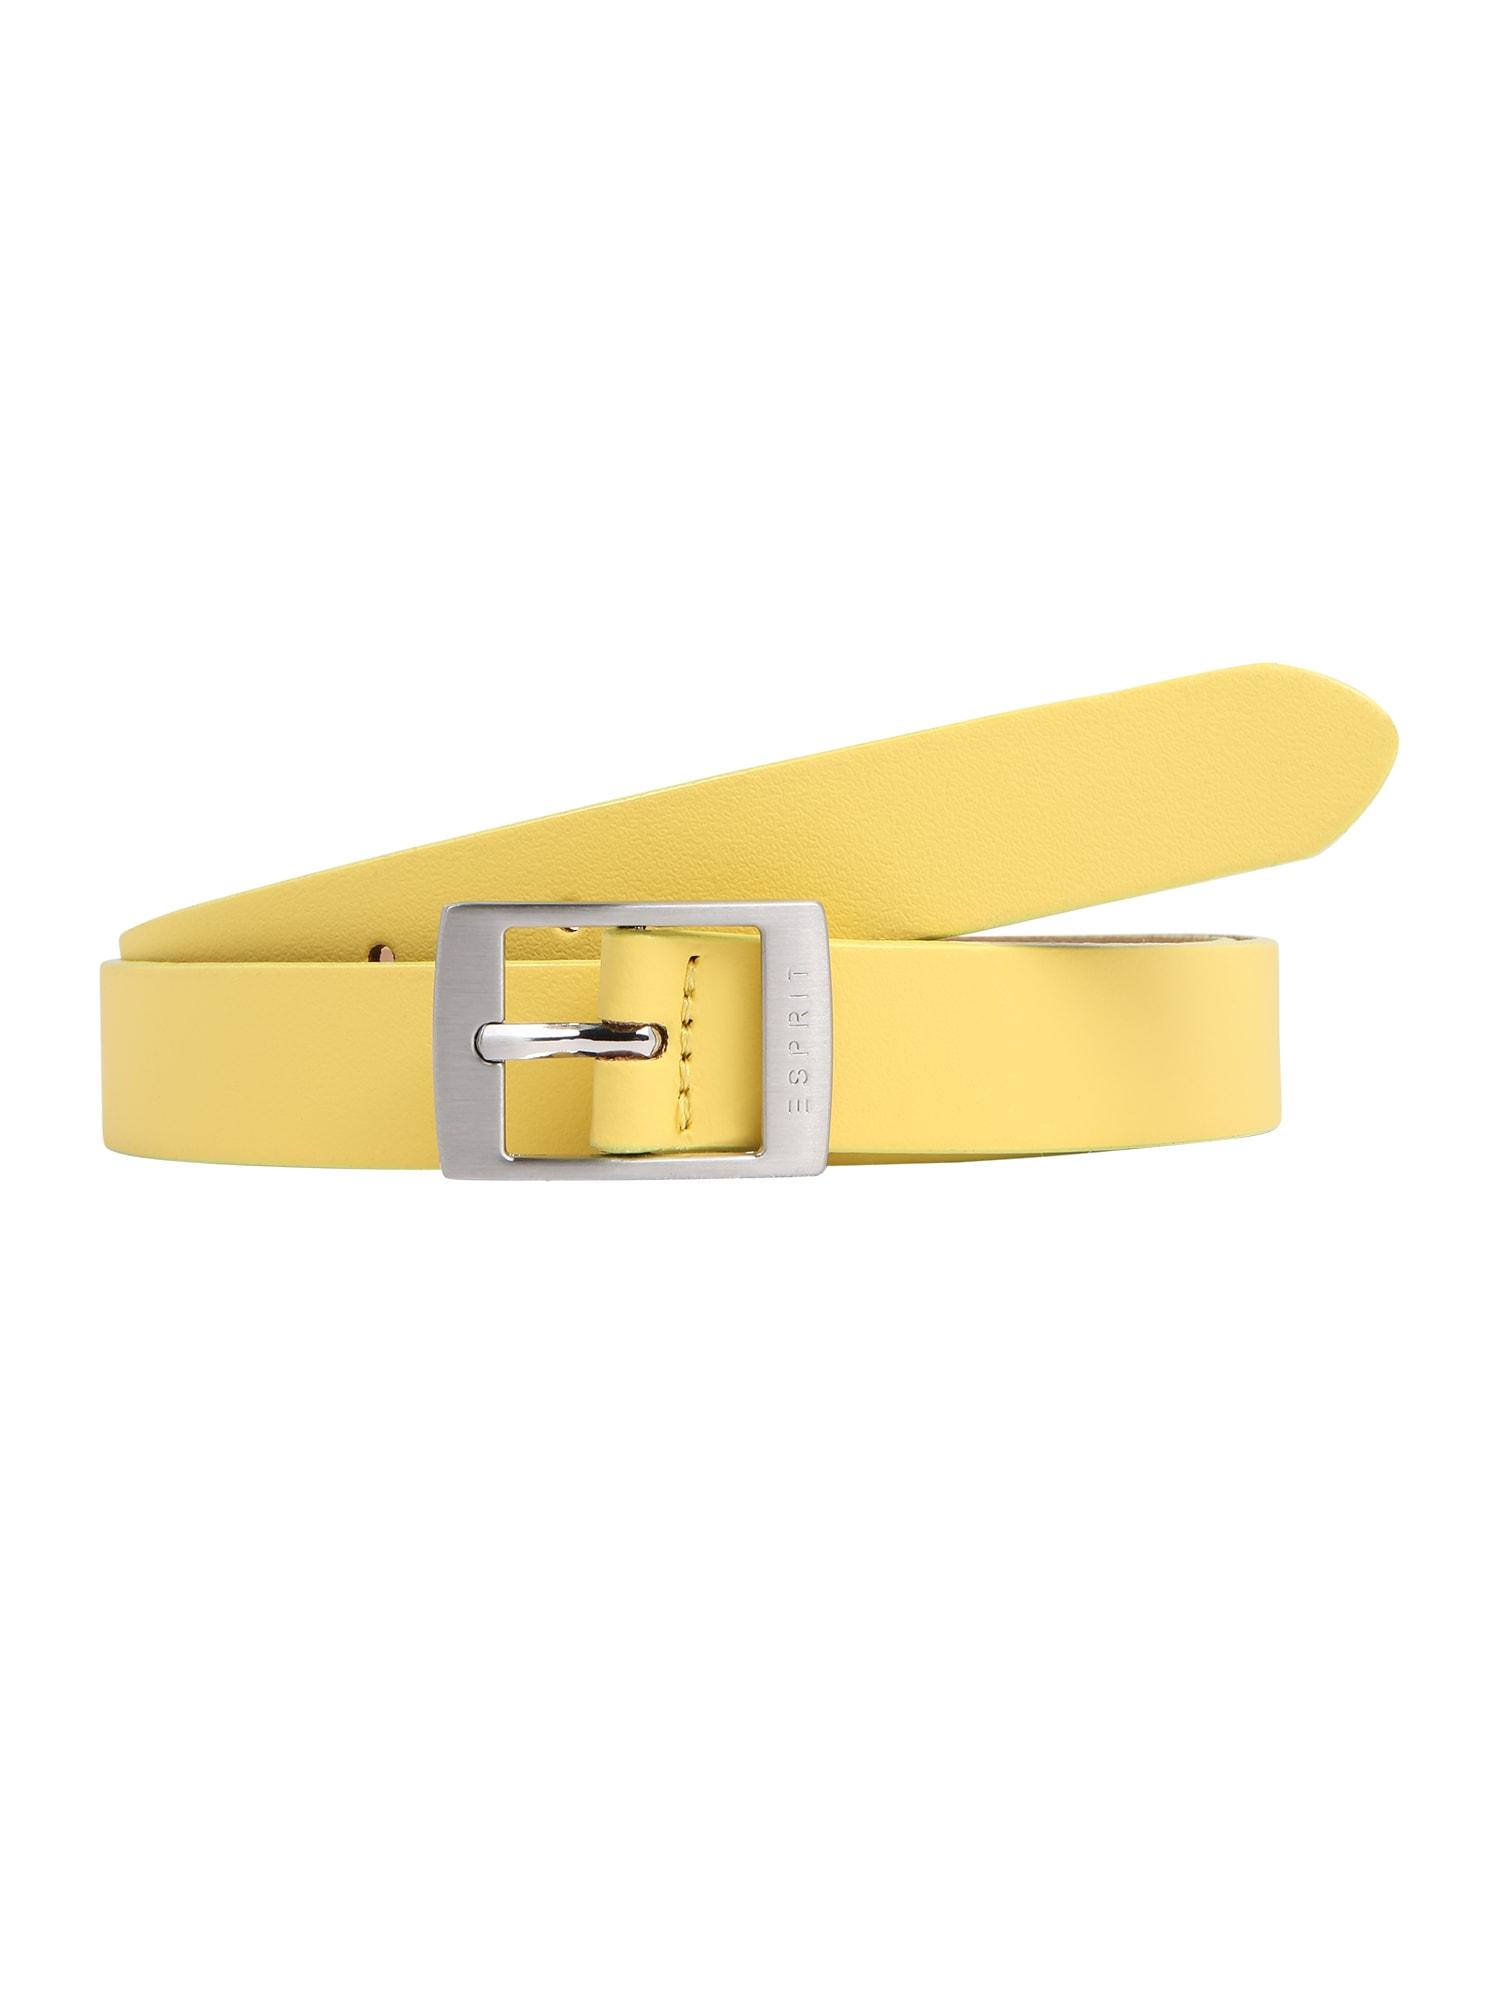 ESPRIT Opasky 'Small Xoctavia'  žlté